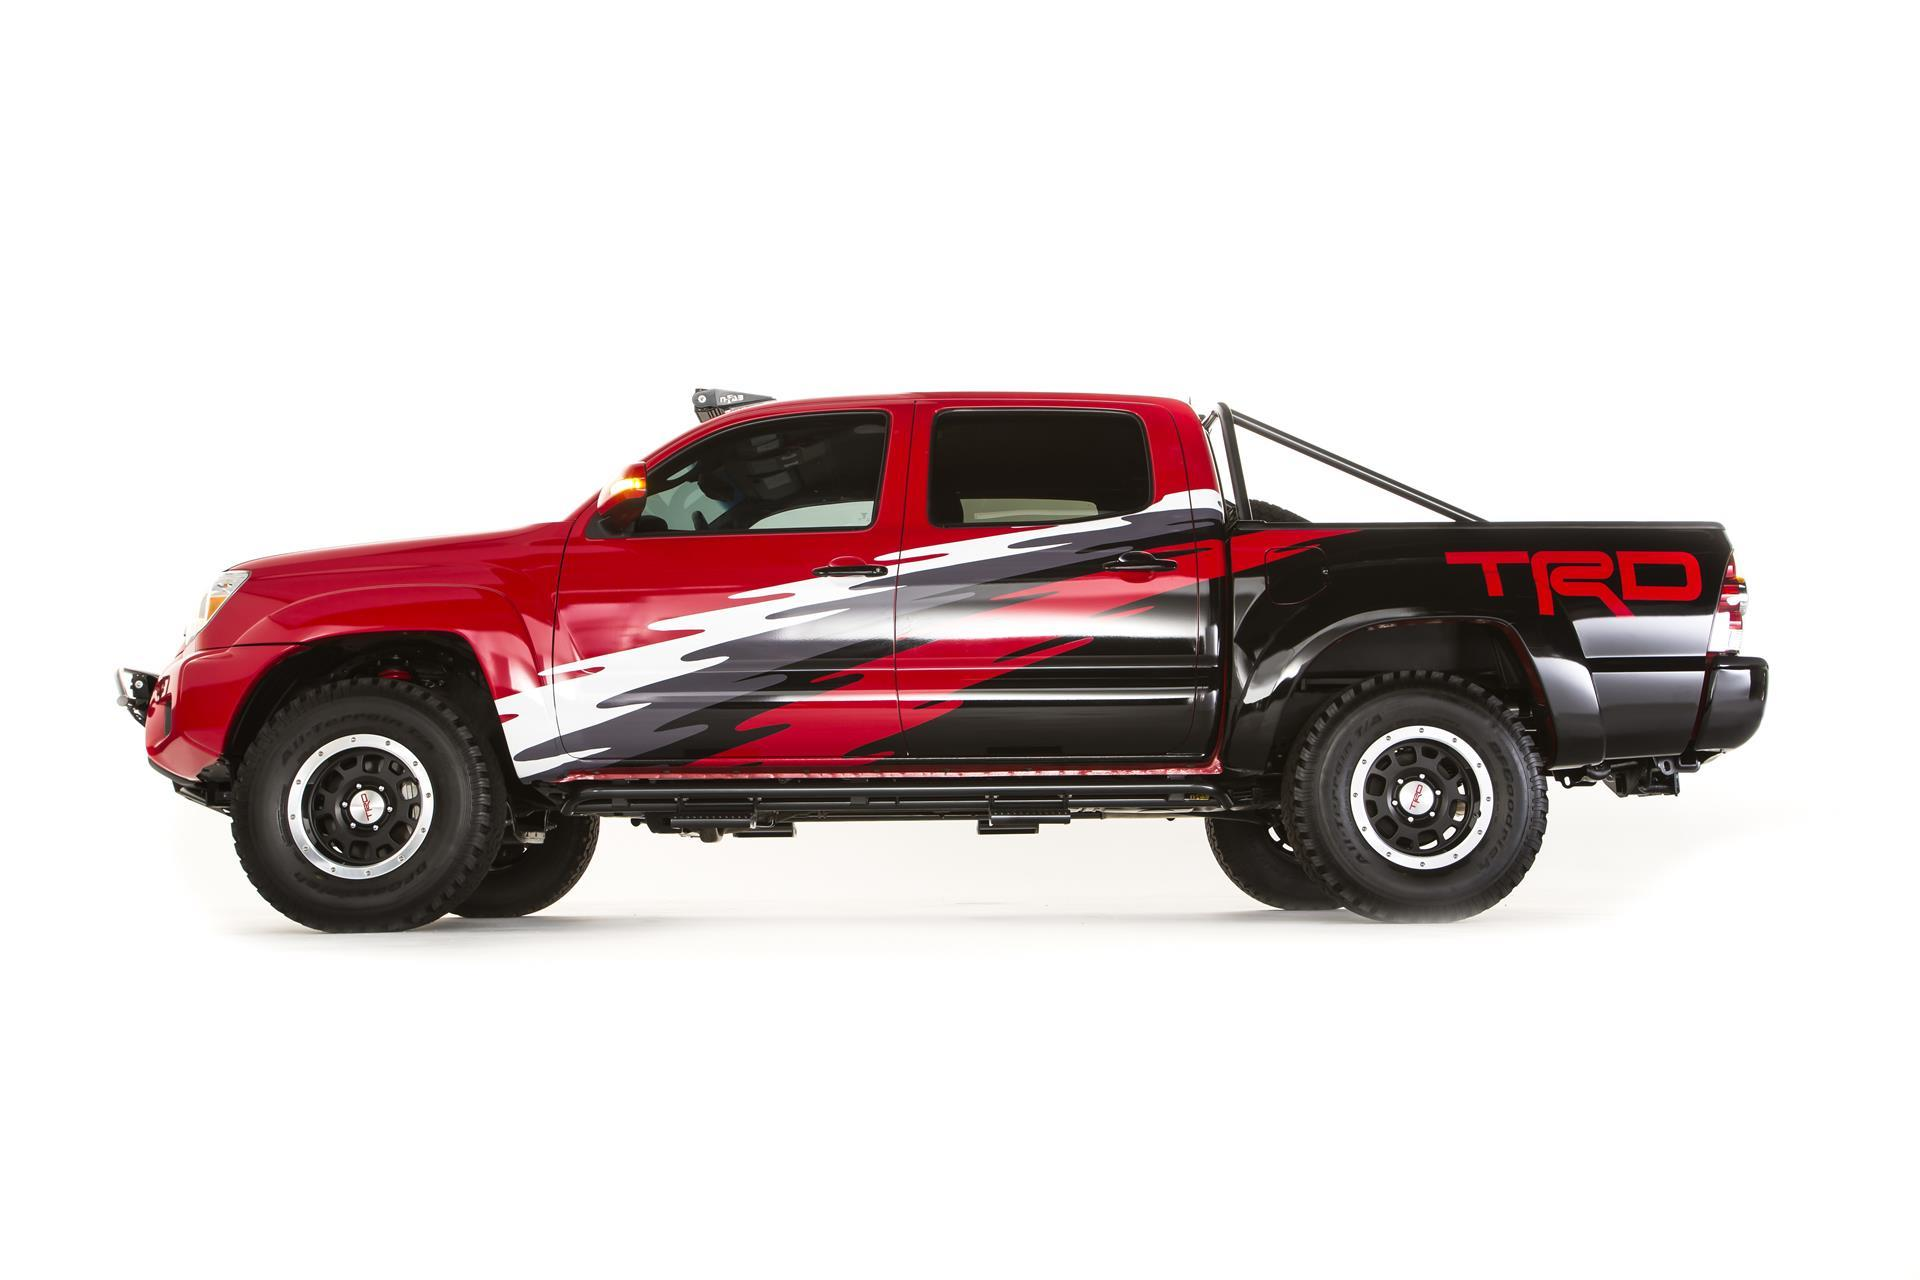 2014 Toyota Tacoma TRD SEMA News and Information